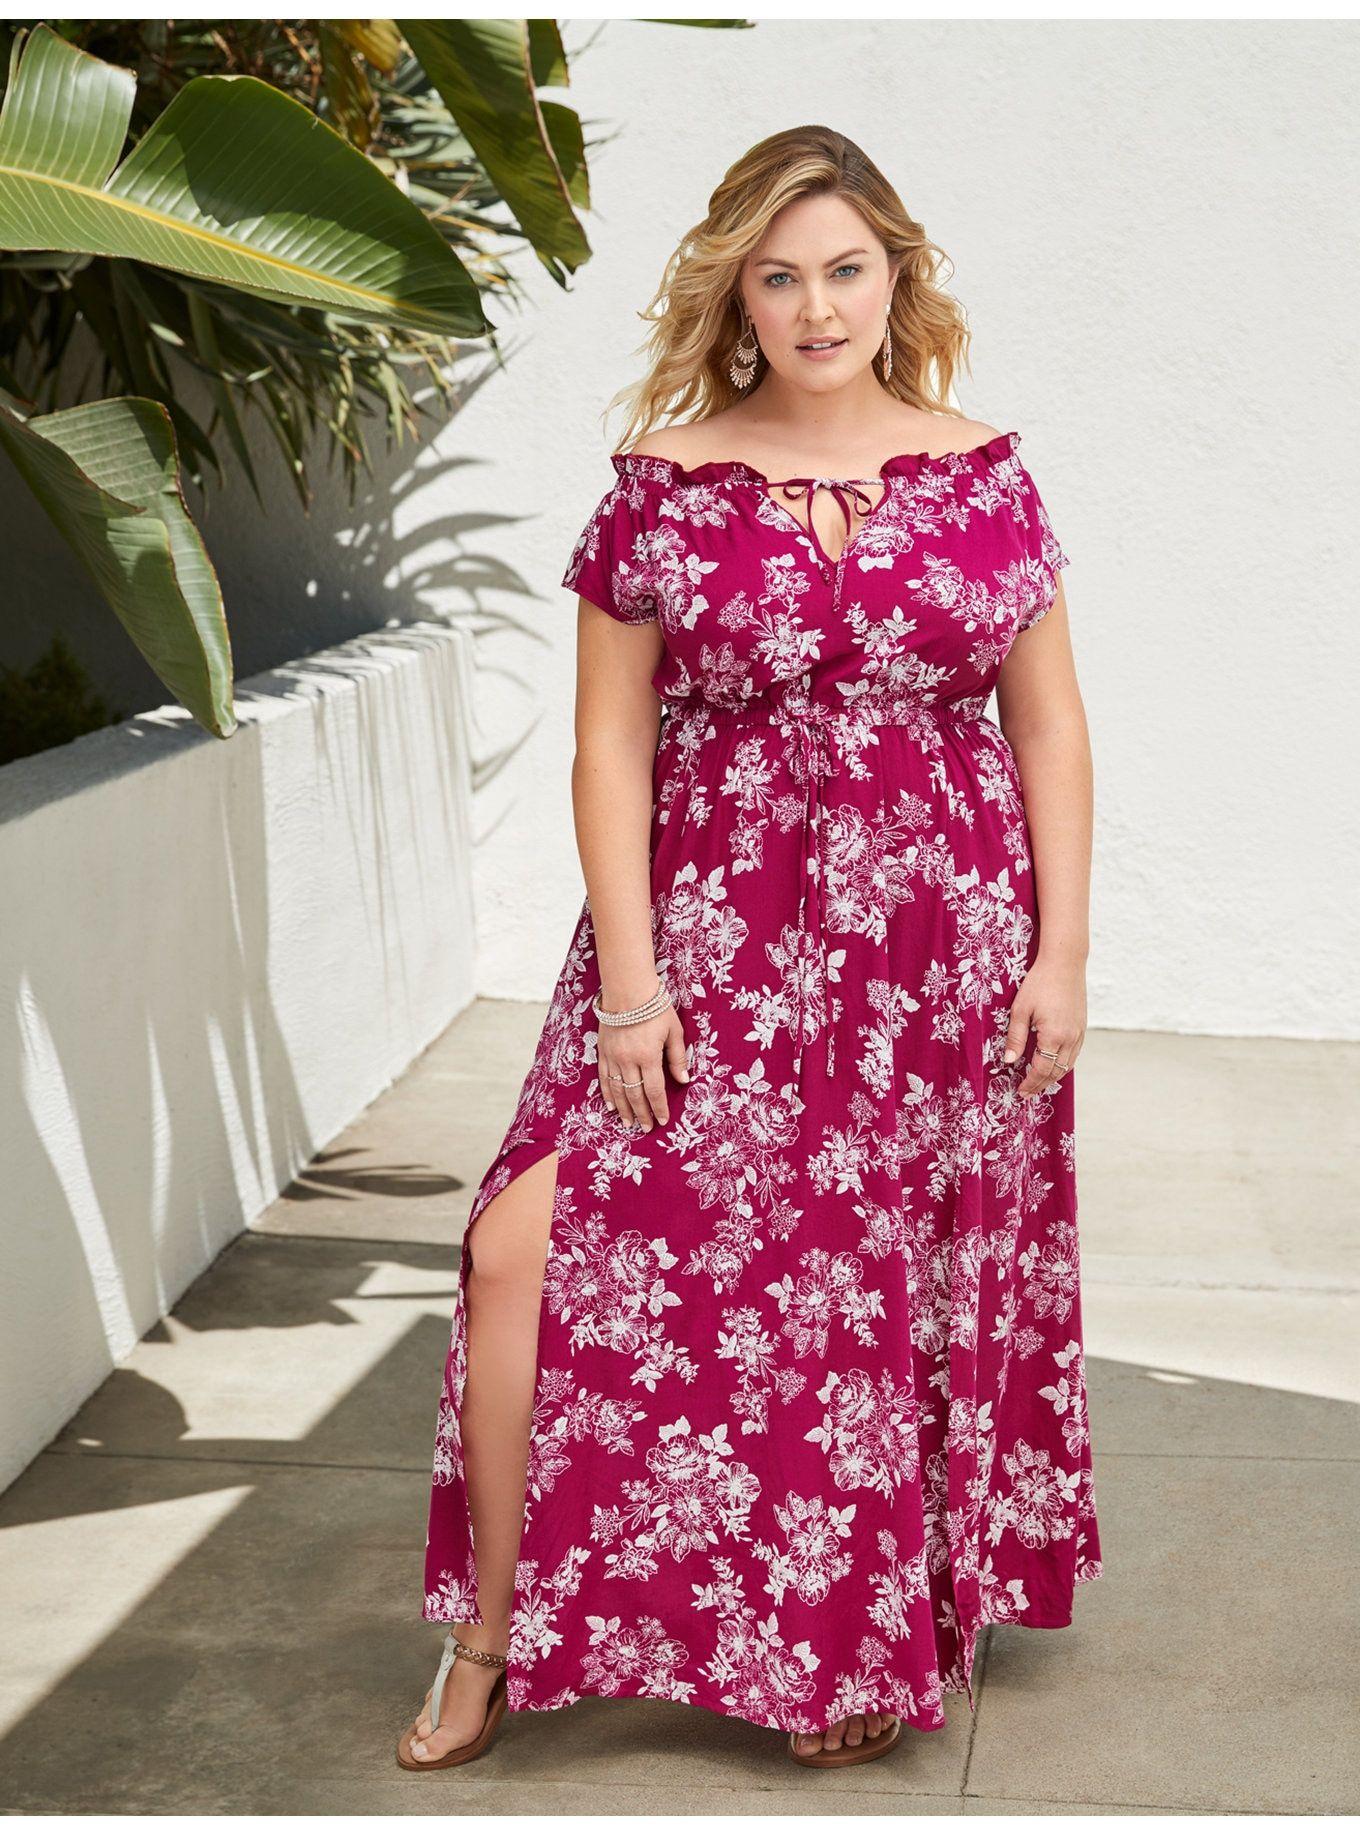 2e6f4f0c331 Berry Floral Challis Slit Maxi Dress in 2019